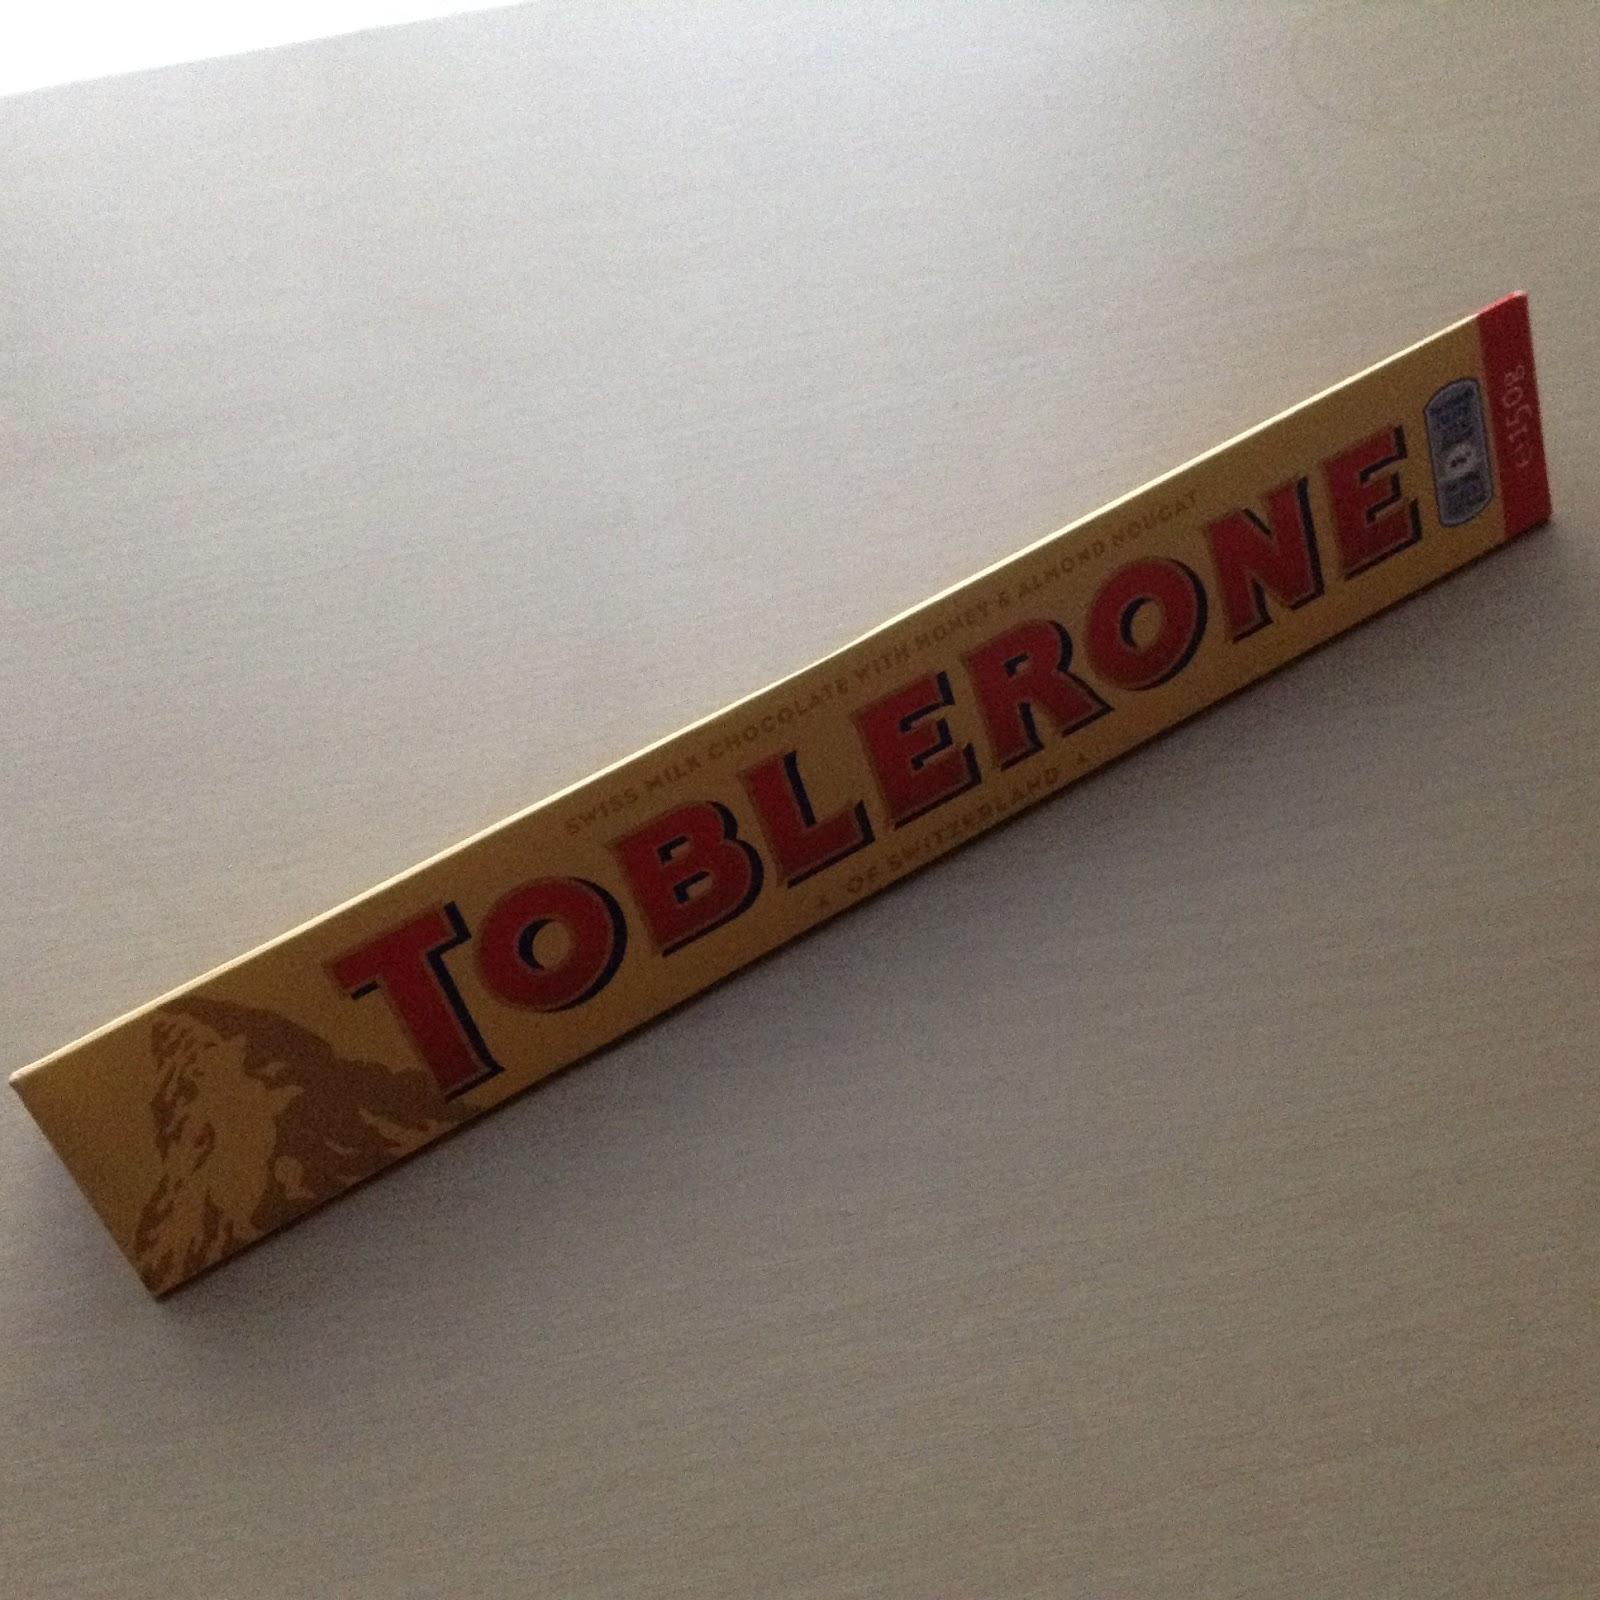 Kev's Snack Reviews: Toblerone Milk Chocolate Review: new shape ...